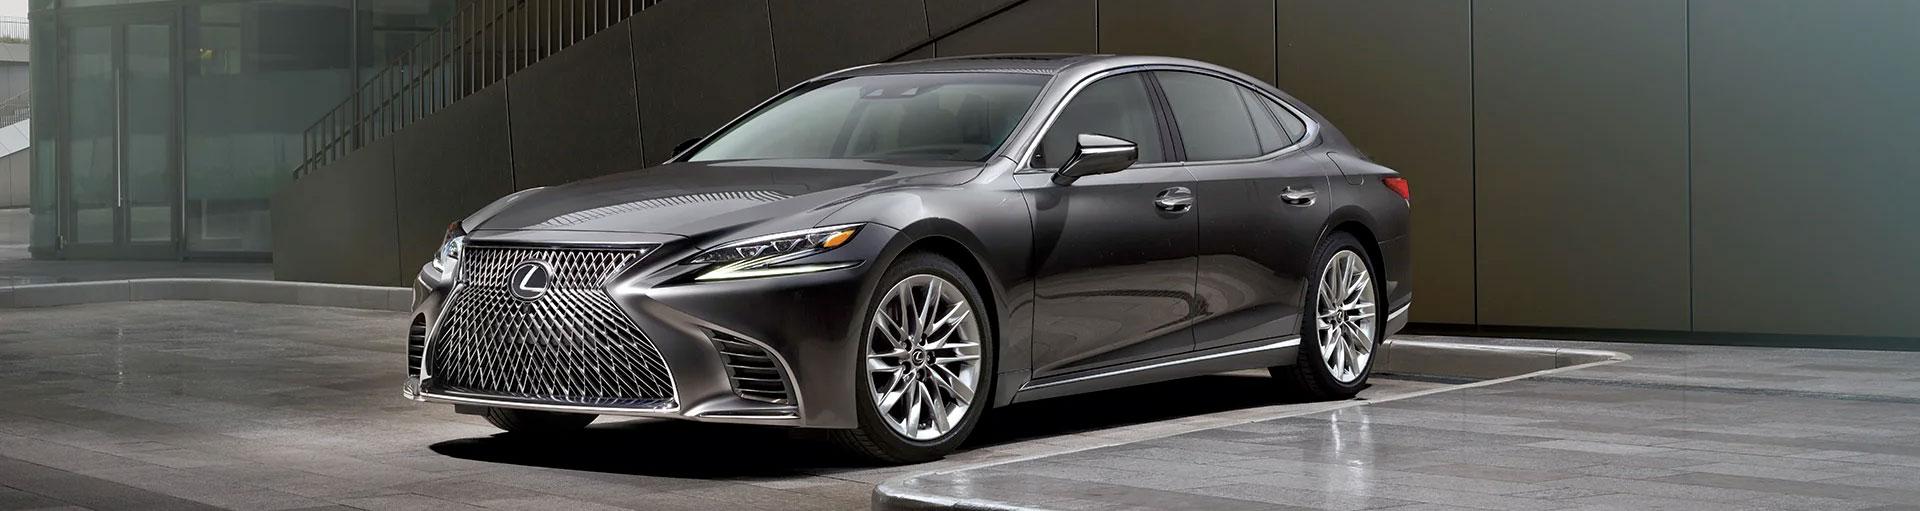 Lexus Brake Services